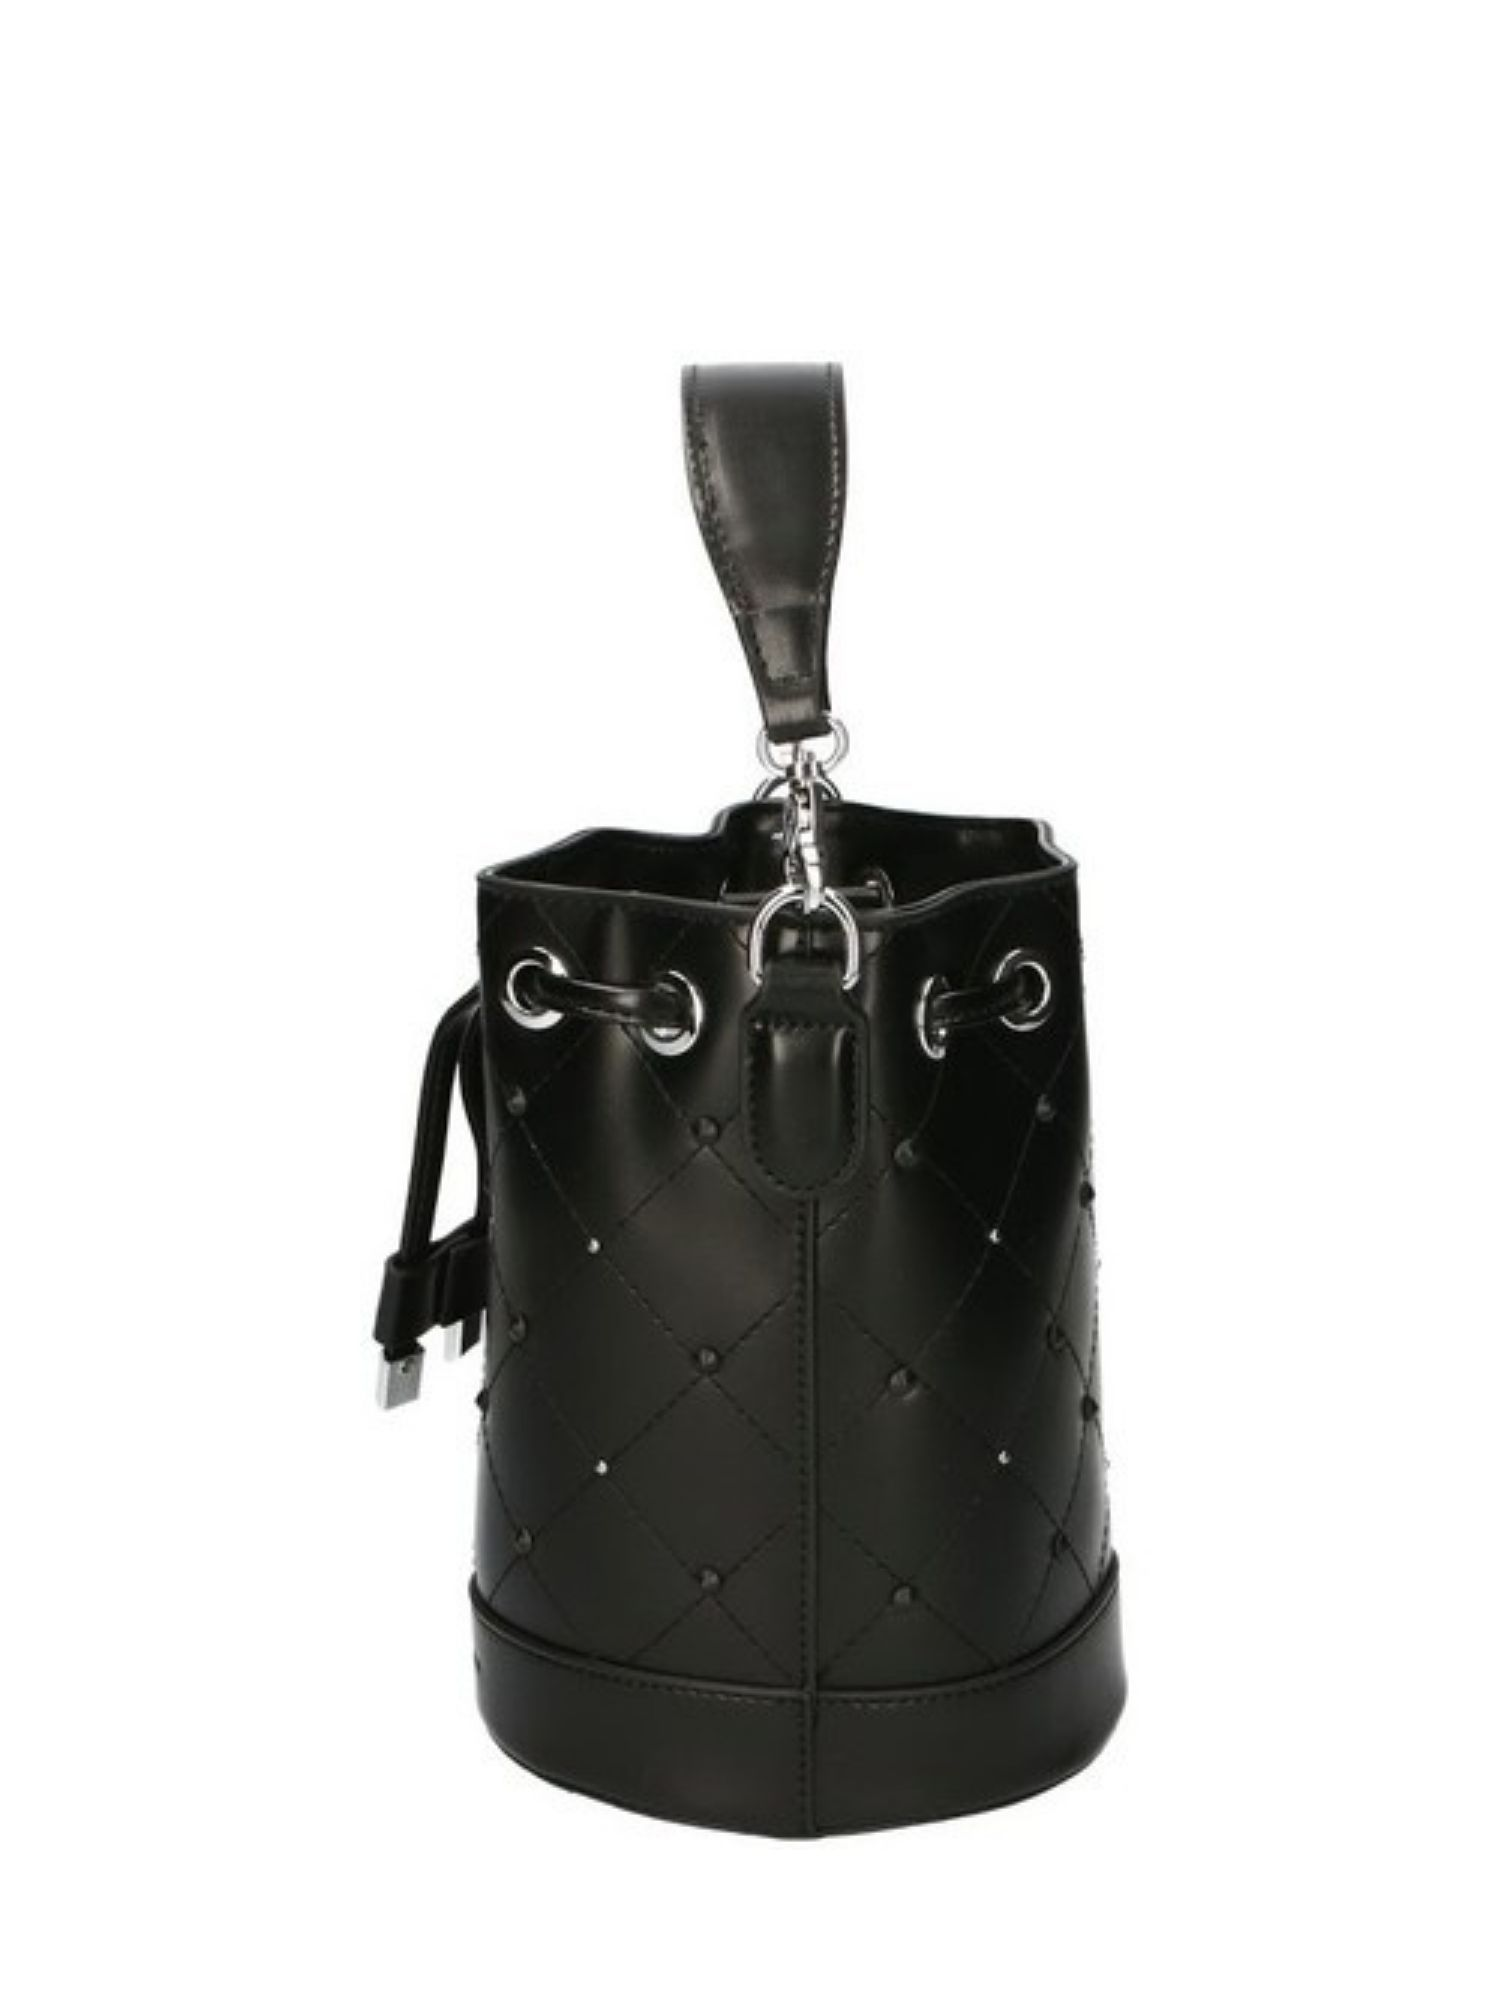 Borsa secchiello Atelier Du Sac Pash Bag 10965 Nero 2 1